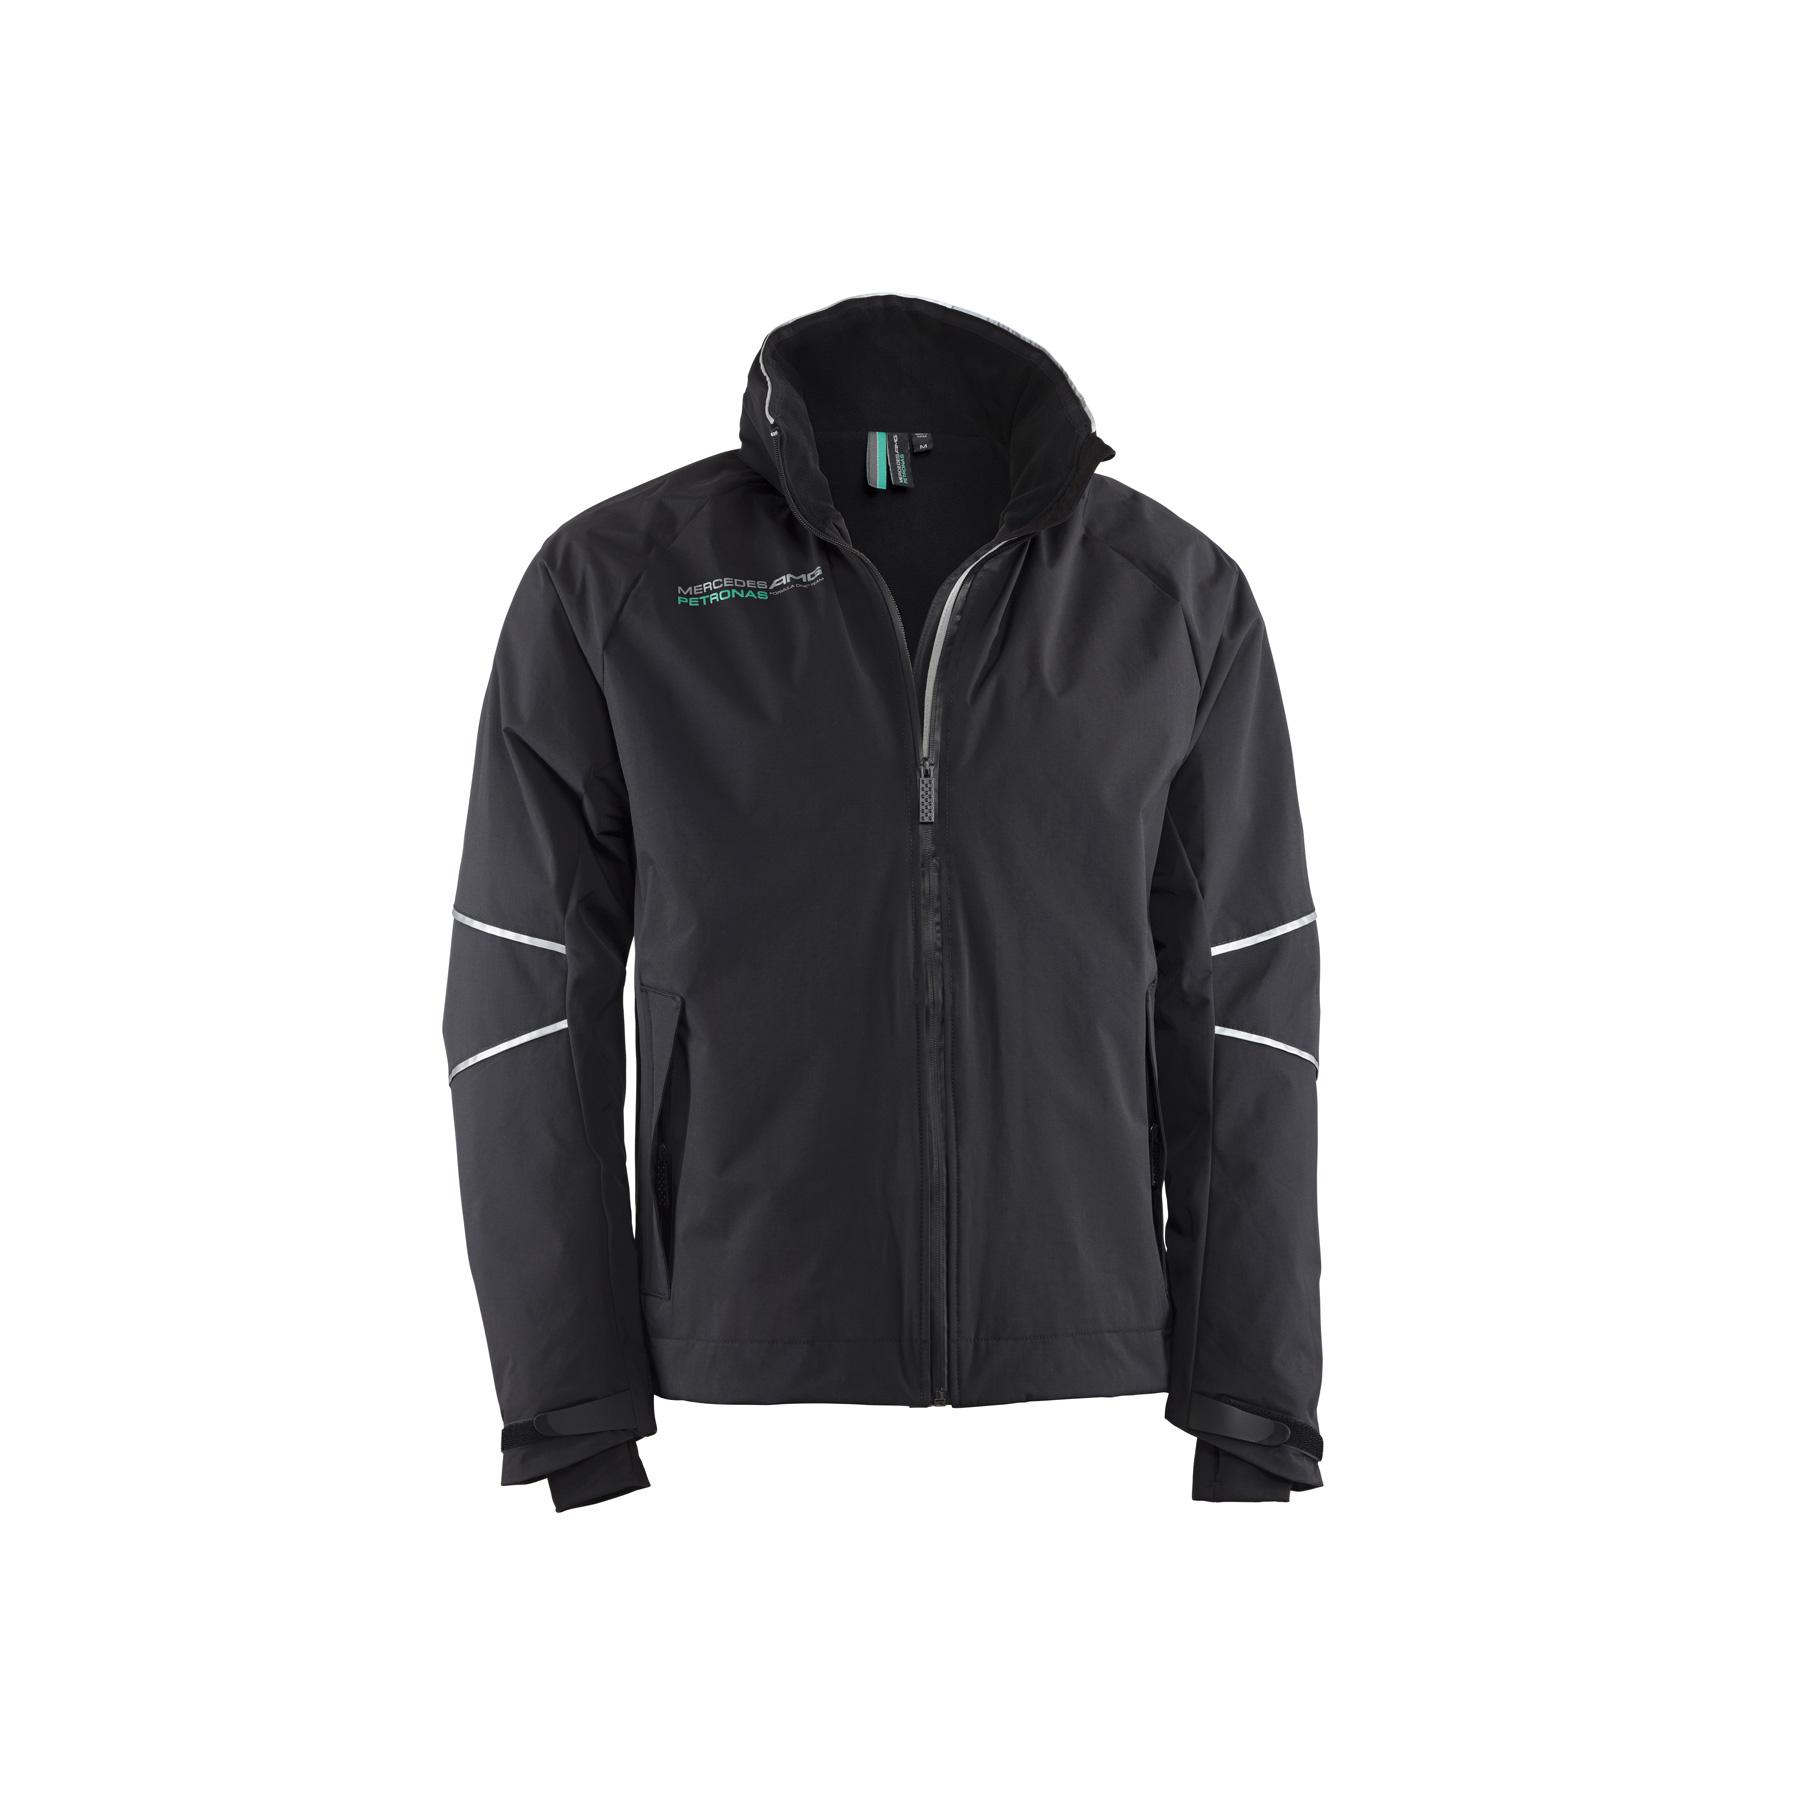 2014 mercedes amg formule 1 homme outdoor quipe f1 veste manteau imperm able polaire ebay. Black Bedroom Furniture Sets. Home Design Ideas